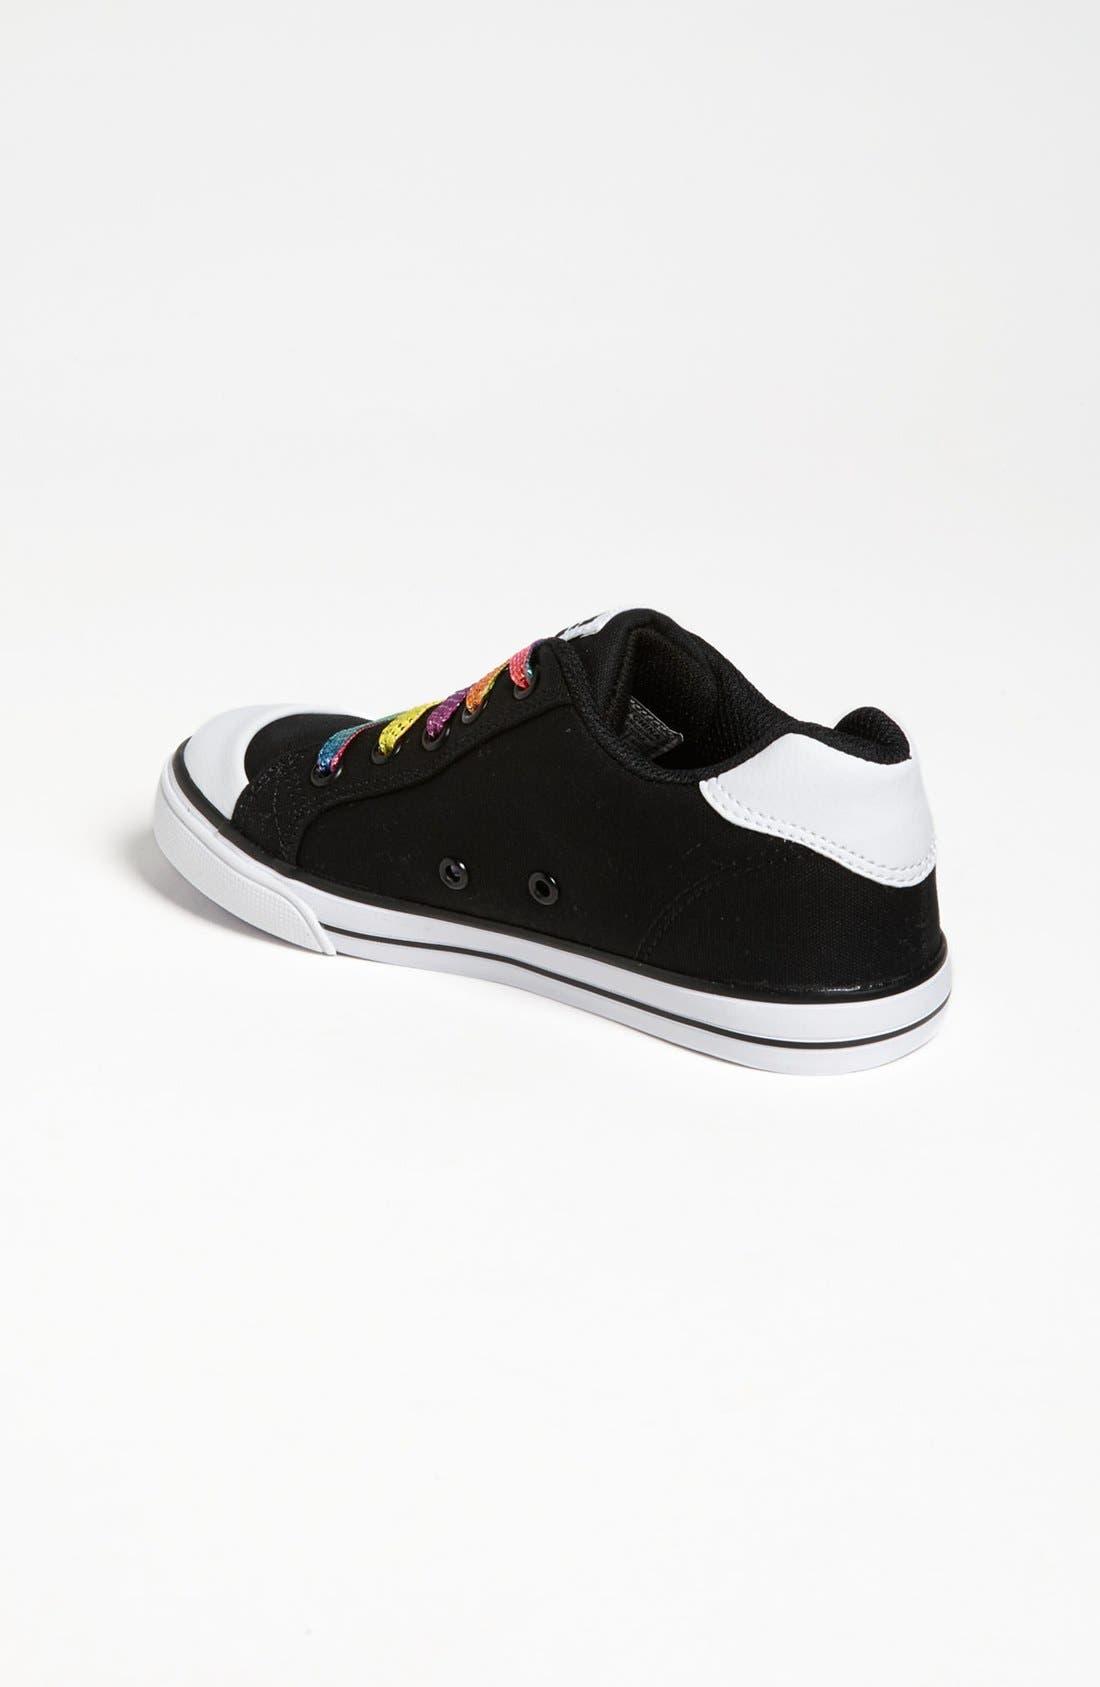 Alternate Image 2  - DC Shoes 'Chelsea' Sneaker (Toddler, Little Kid & Big Kid)